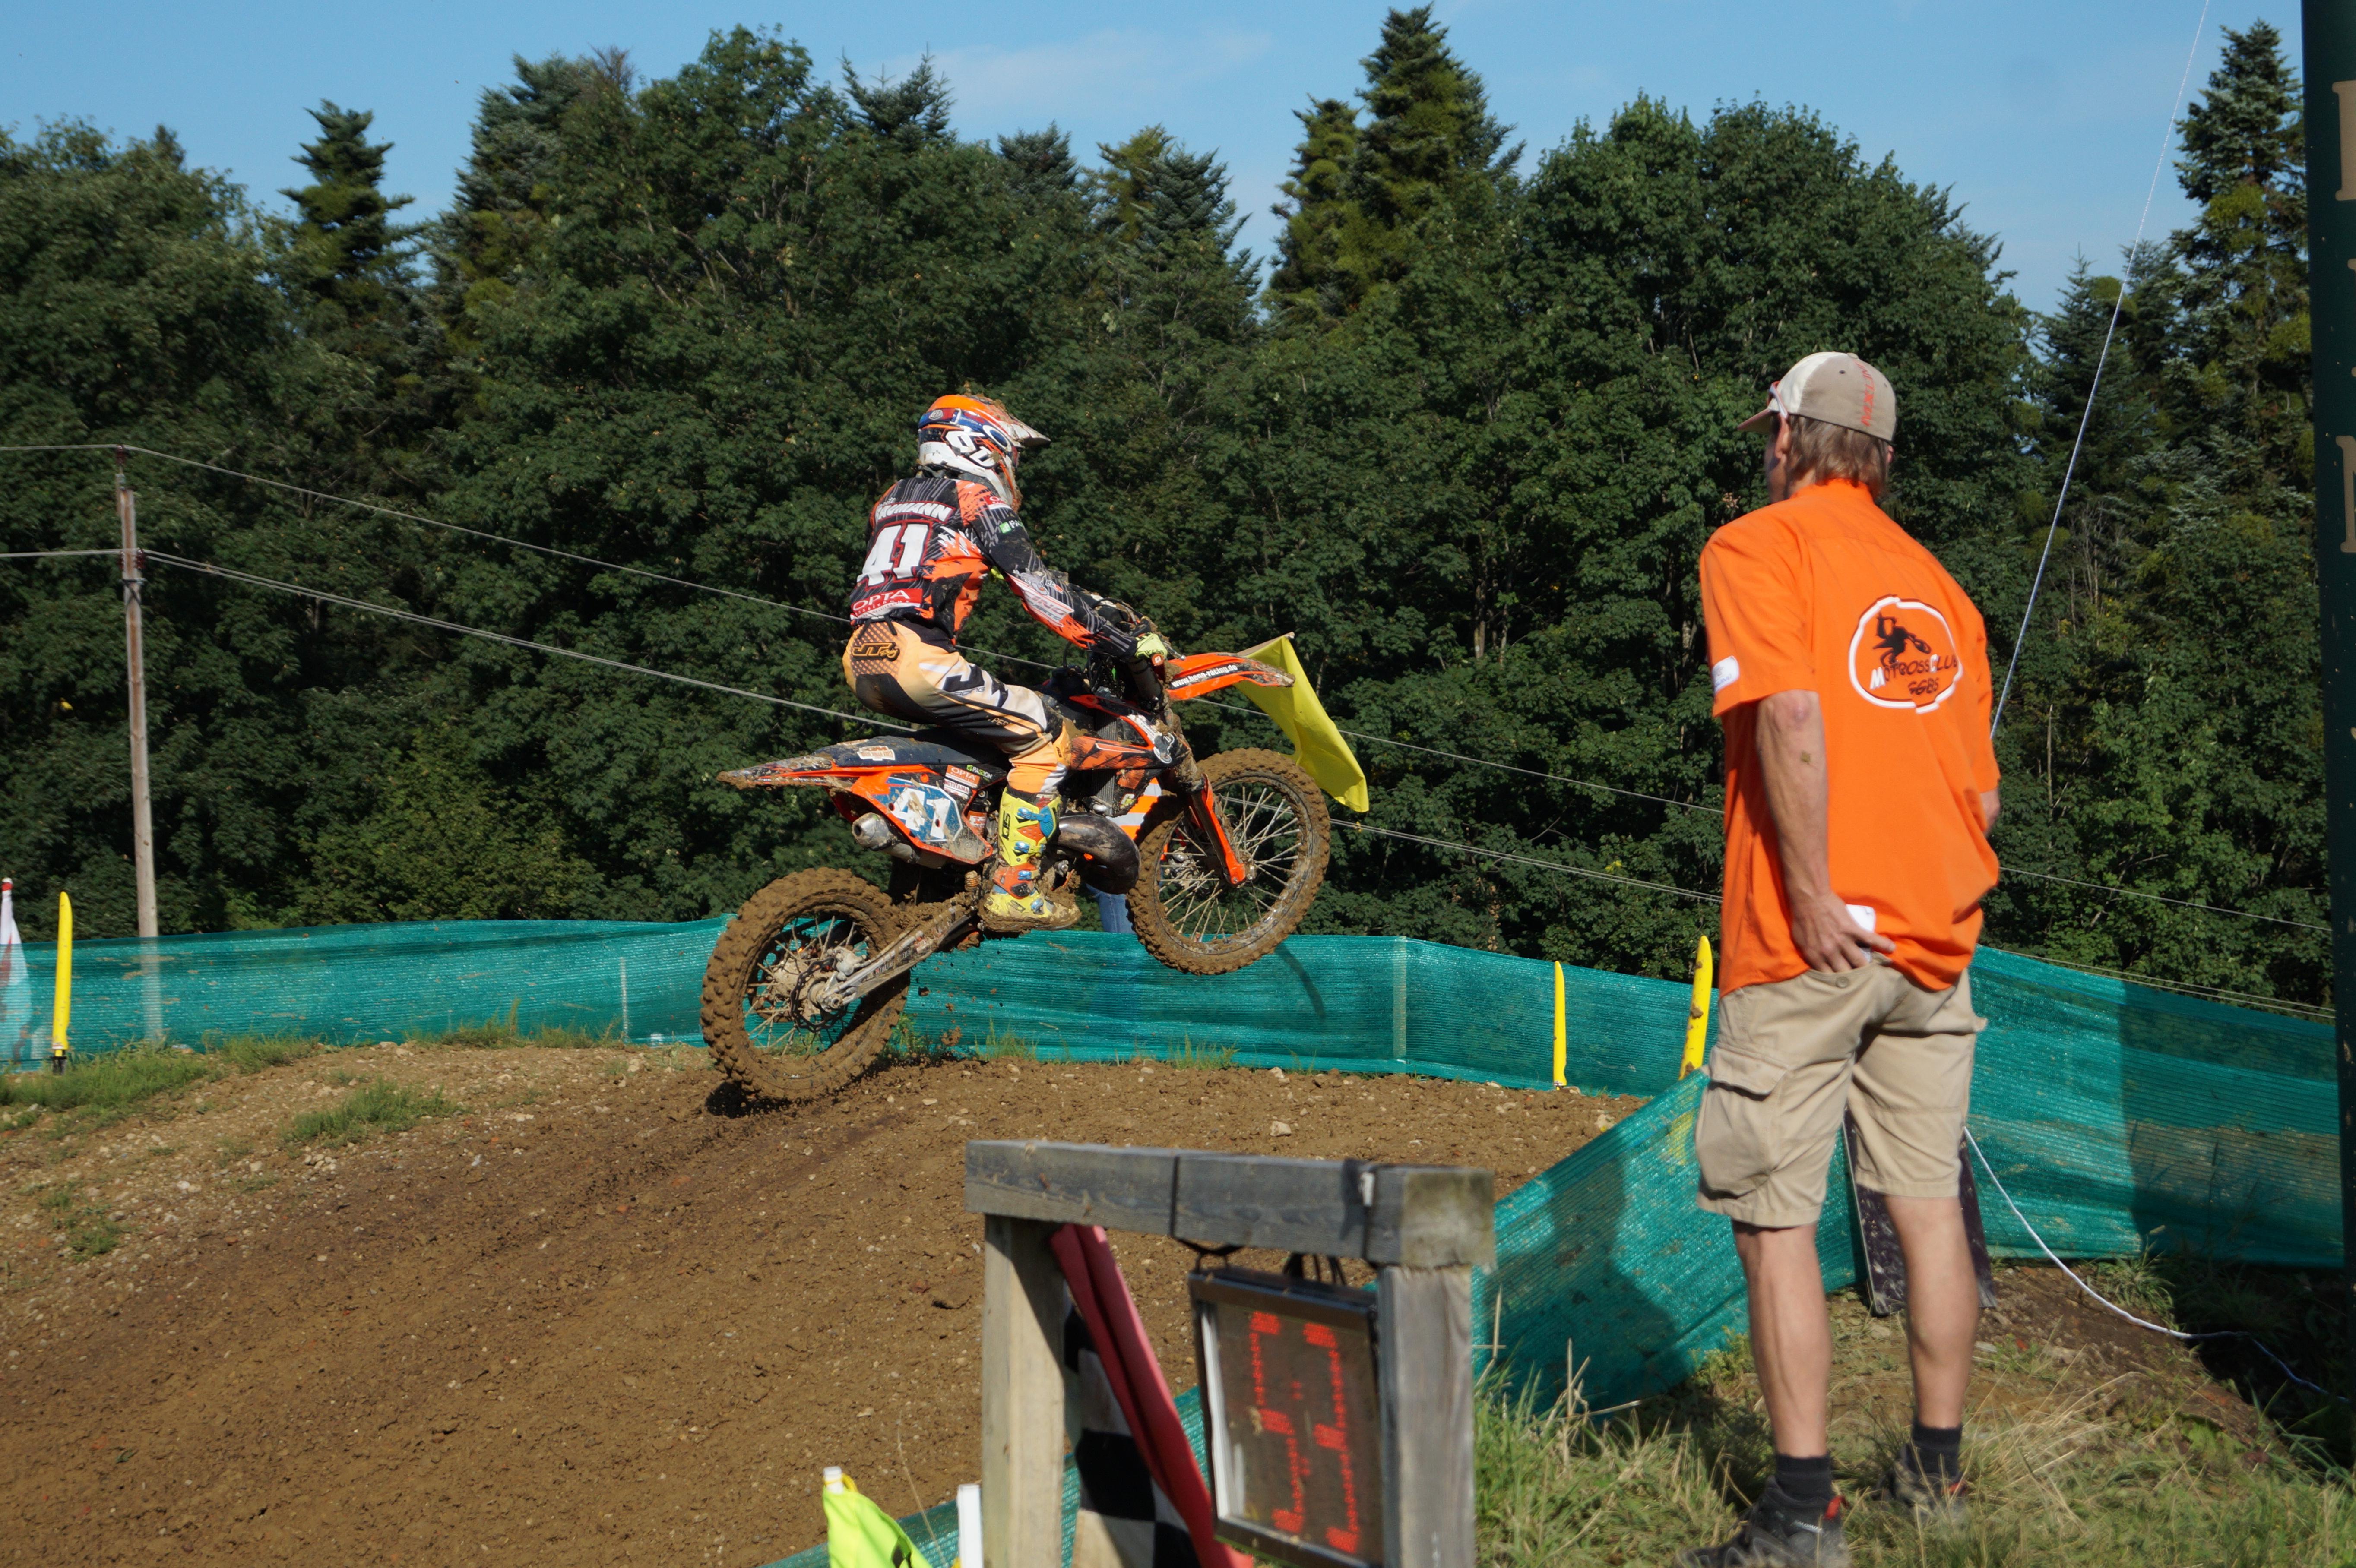 Super Leistung beim Motocross in Möggers